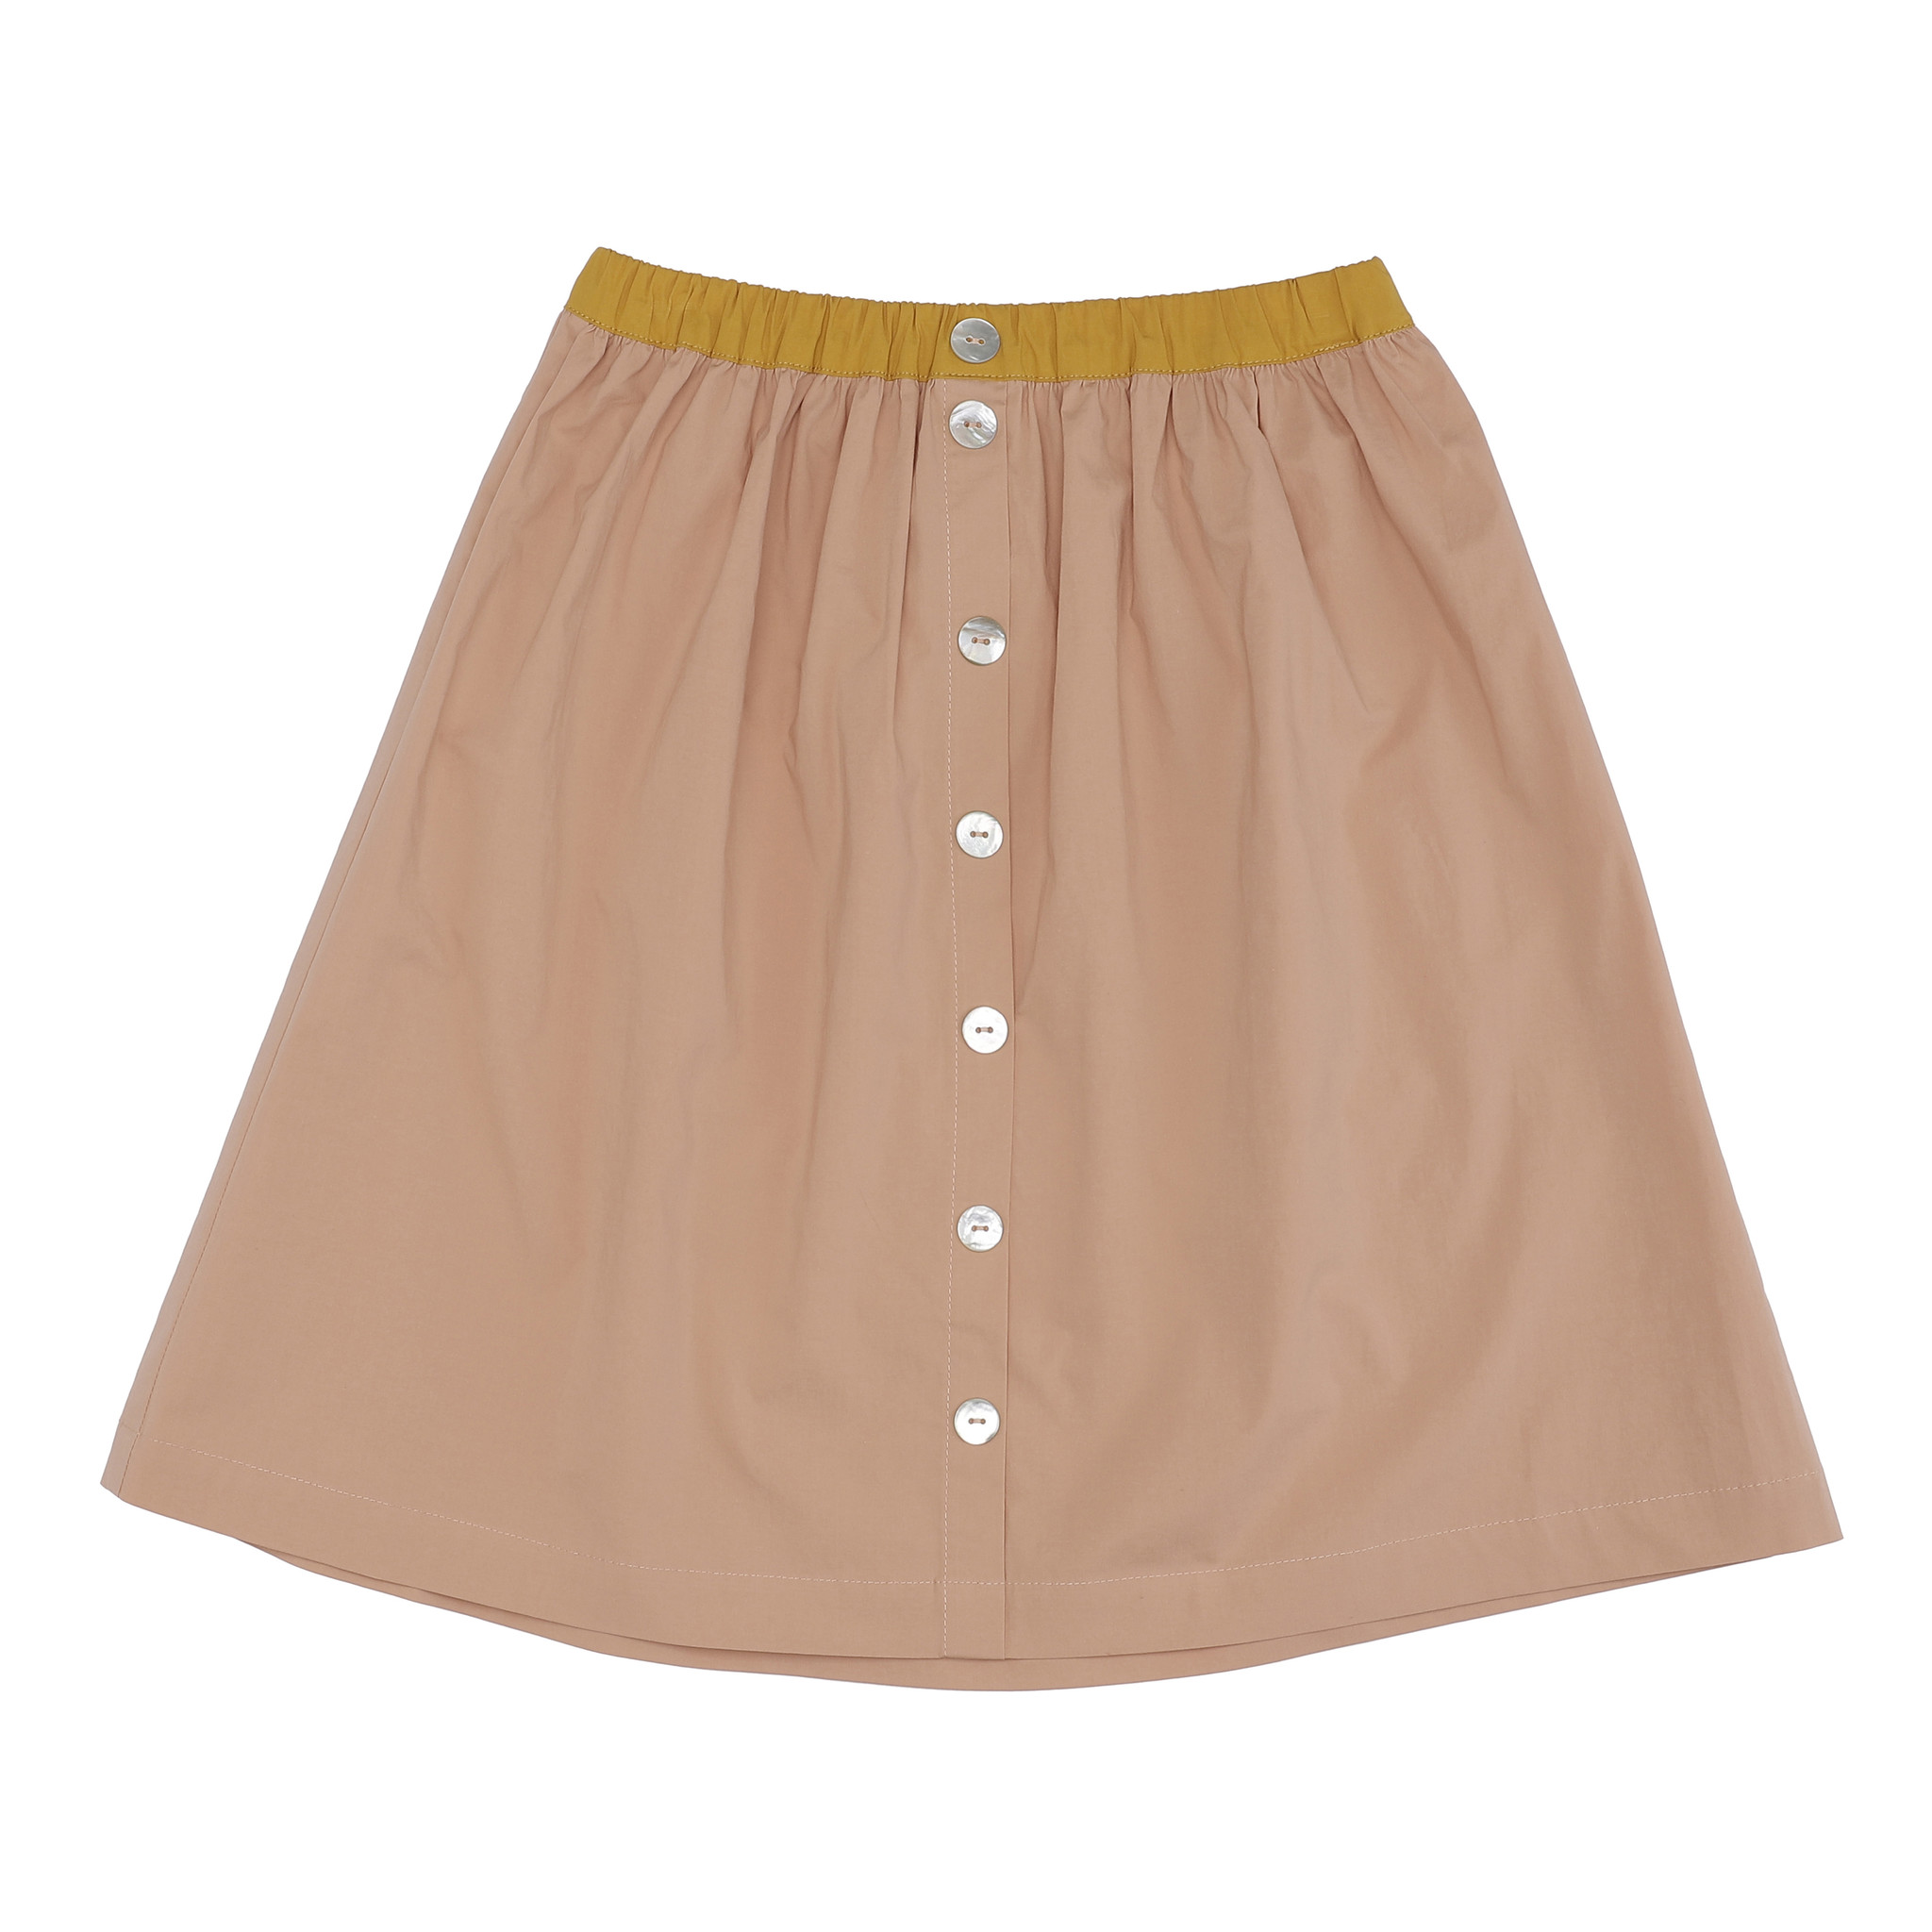 Dixie skirt - Windy Block SS20-1